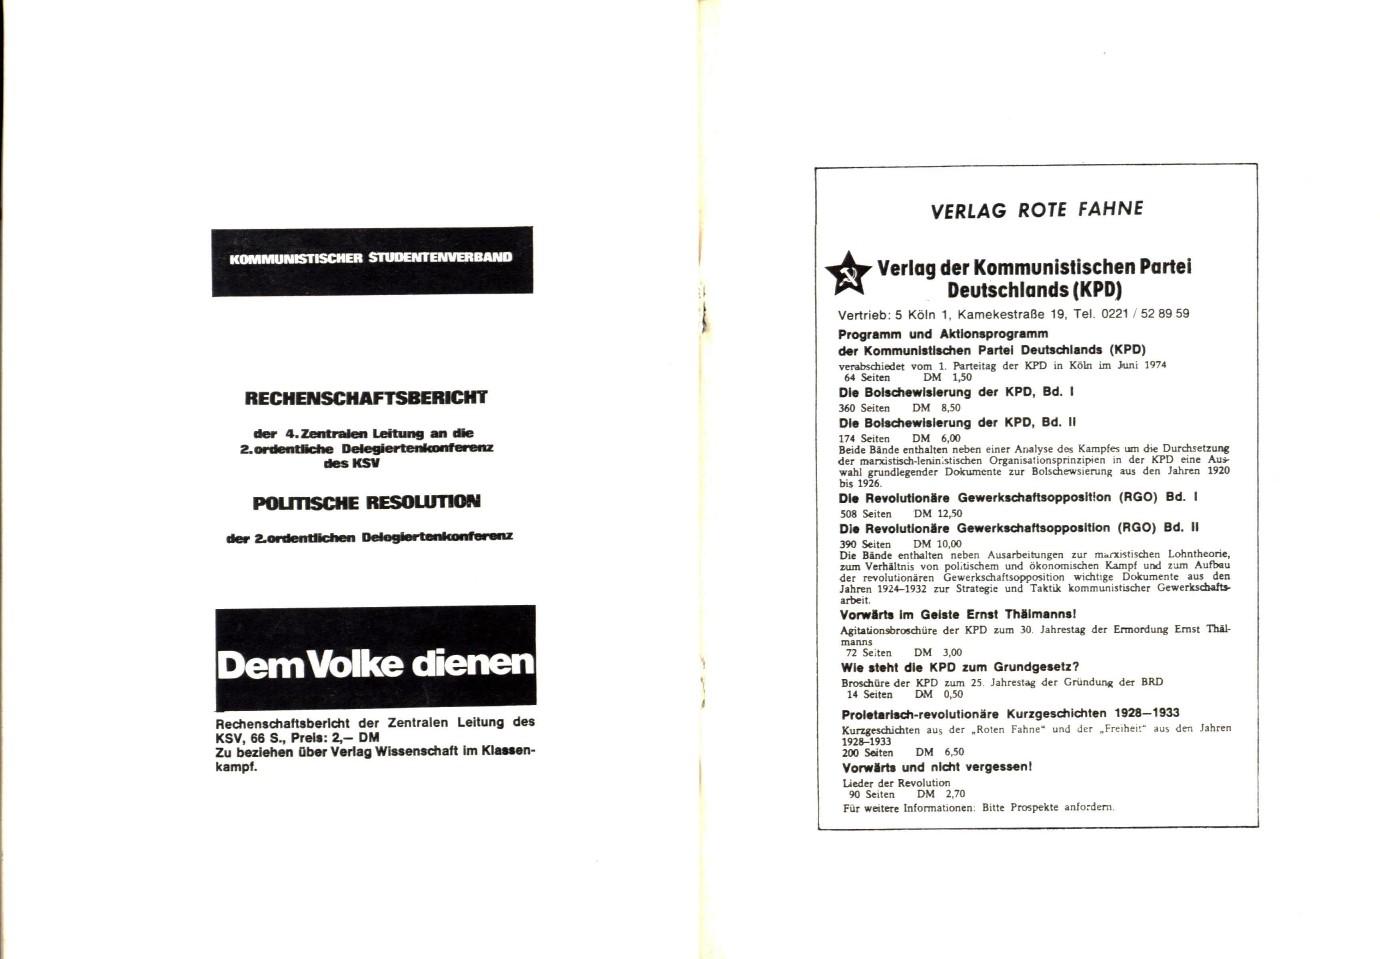 KSV_1975_Lehrerausbildung_29